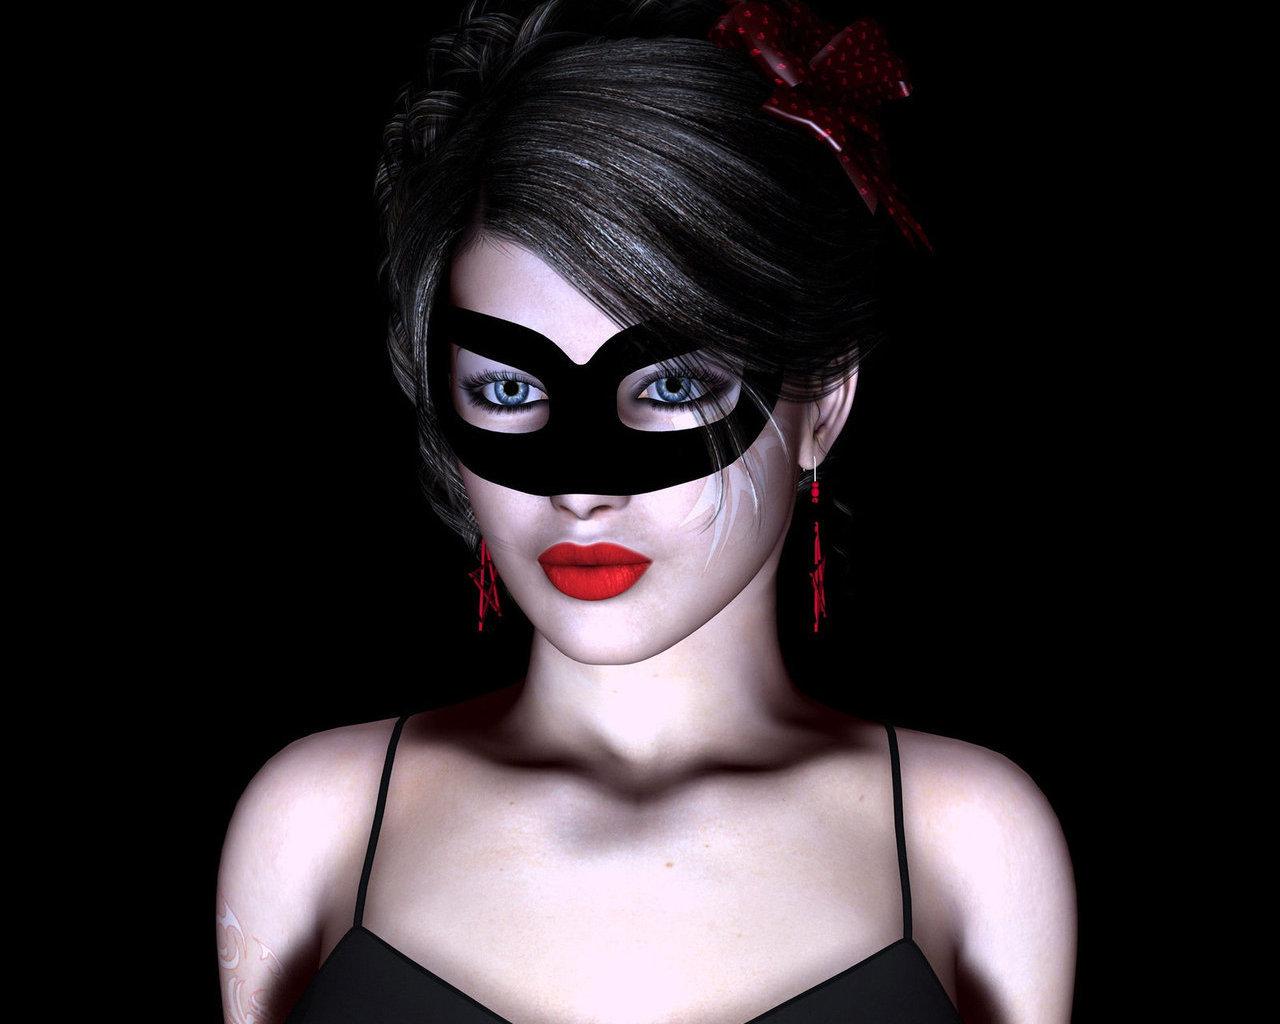 Фото девушки брюнетки в масках